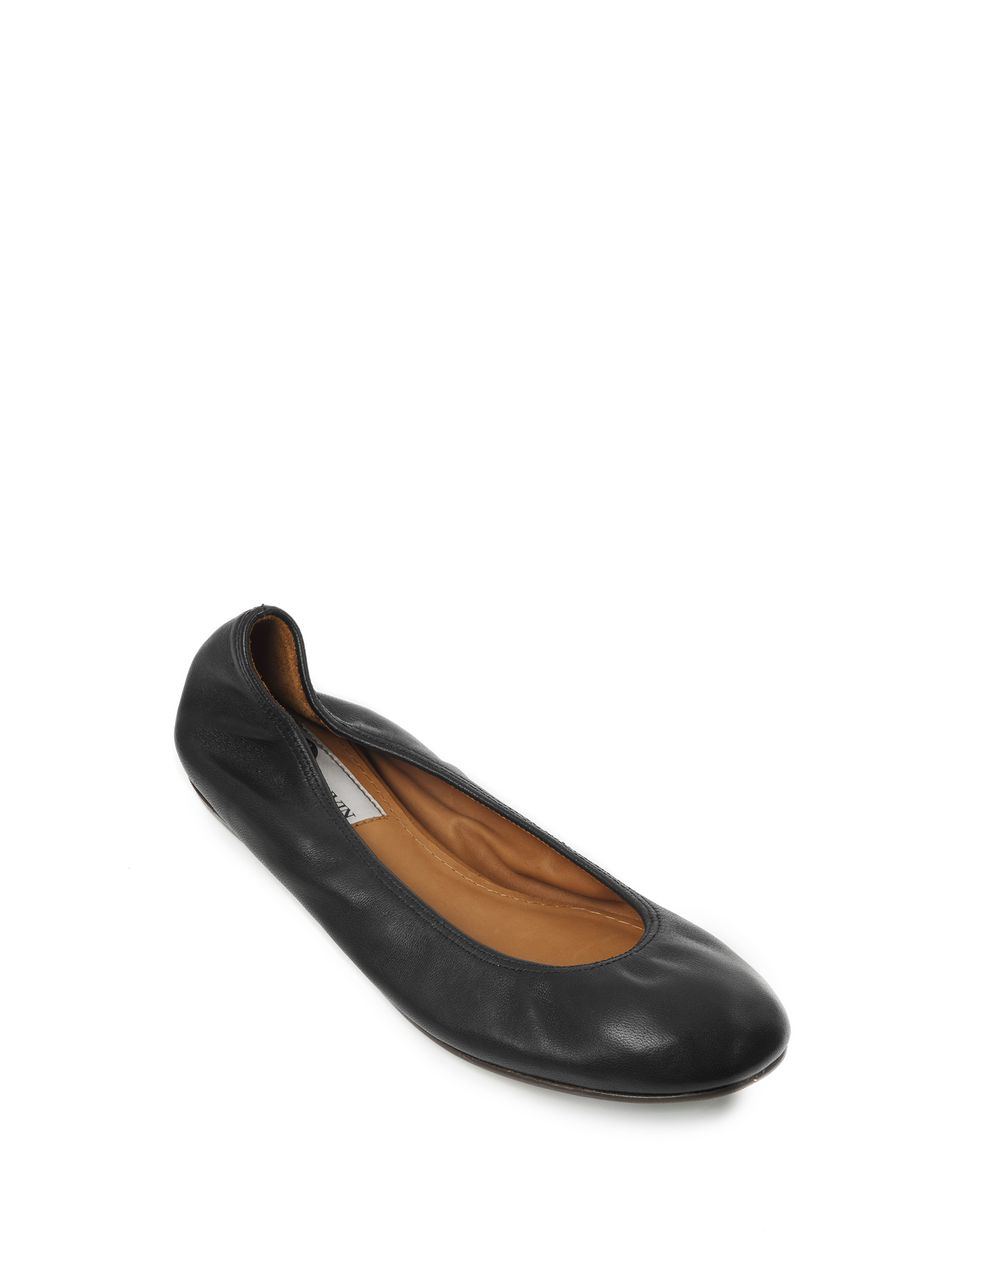 CLASSIC BLACK BALLET PUMP - Lanvin